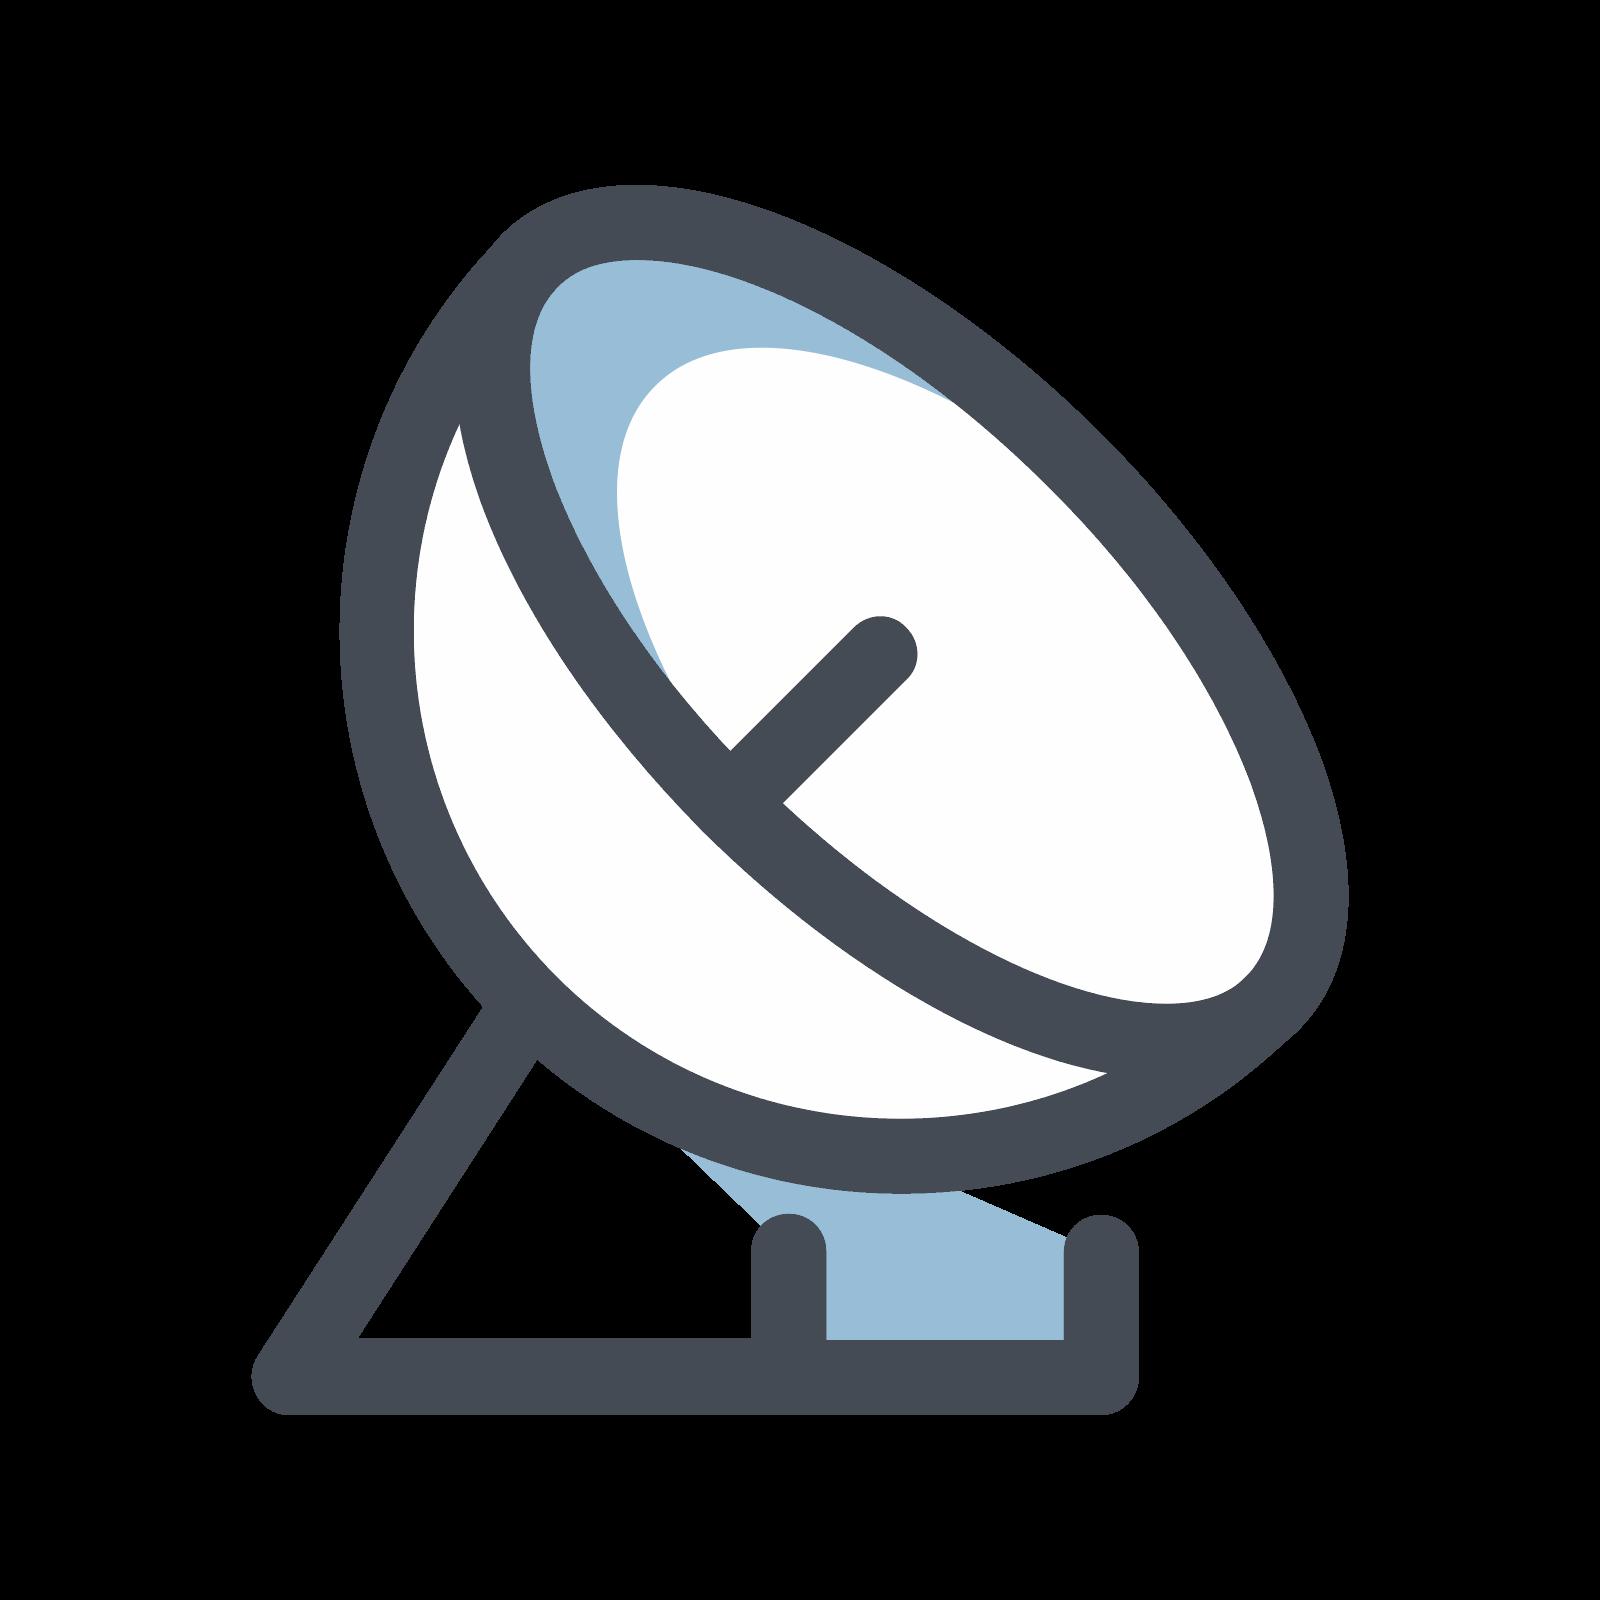 Gps clipart satellite signal. Antenna icon free download